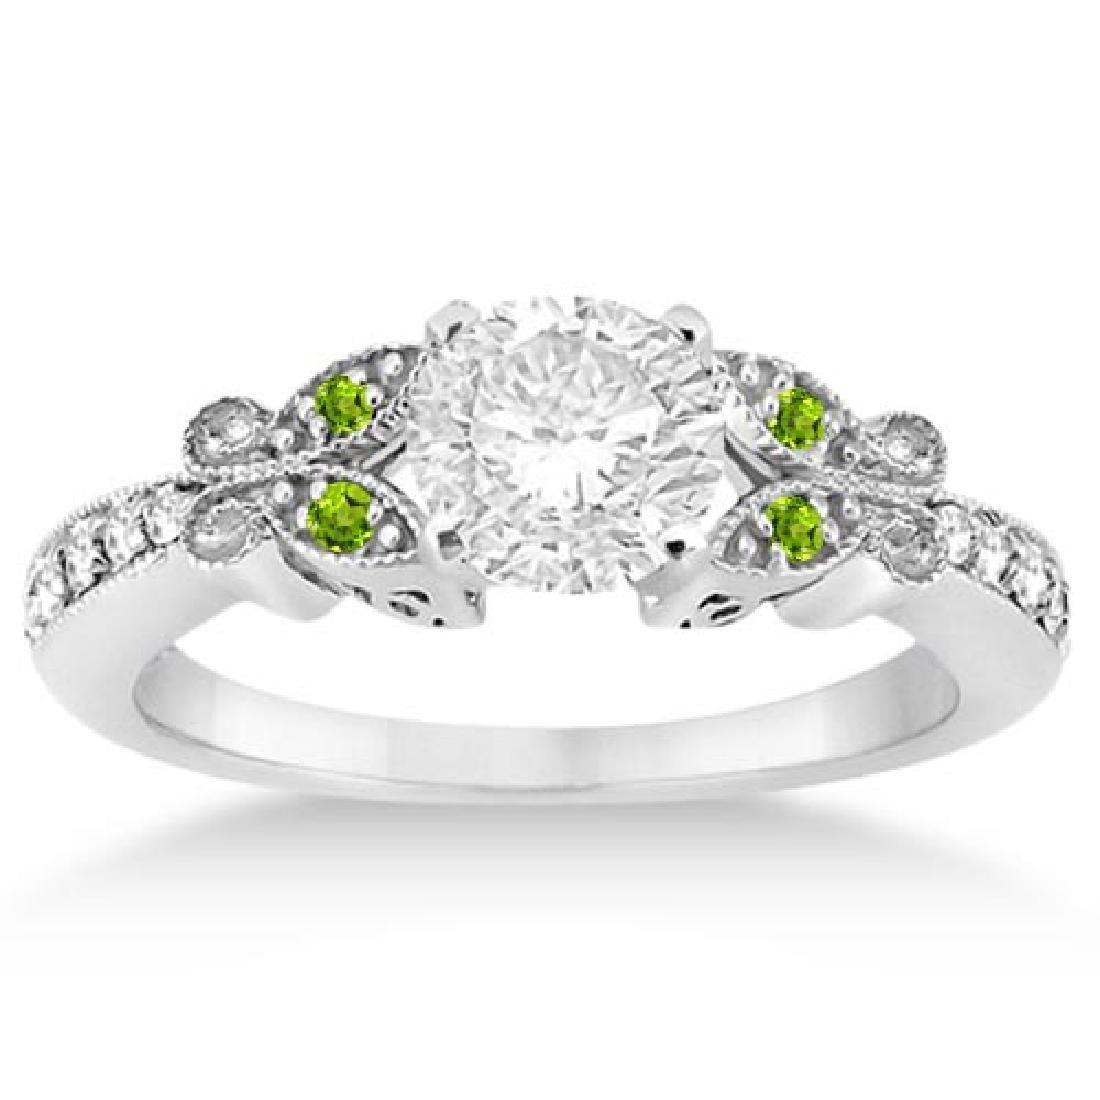 Butterfly Diamond and Peridot Engagement Ring 14k White